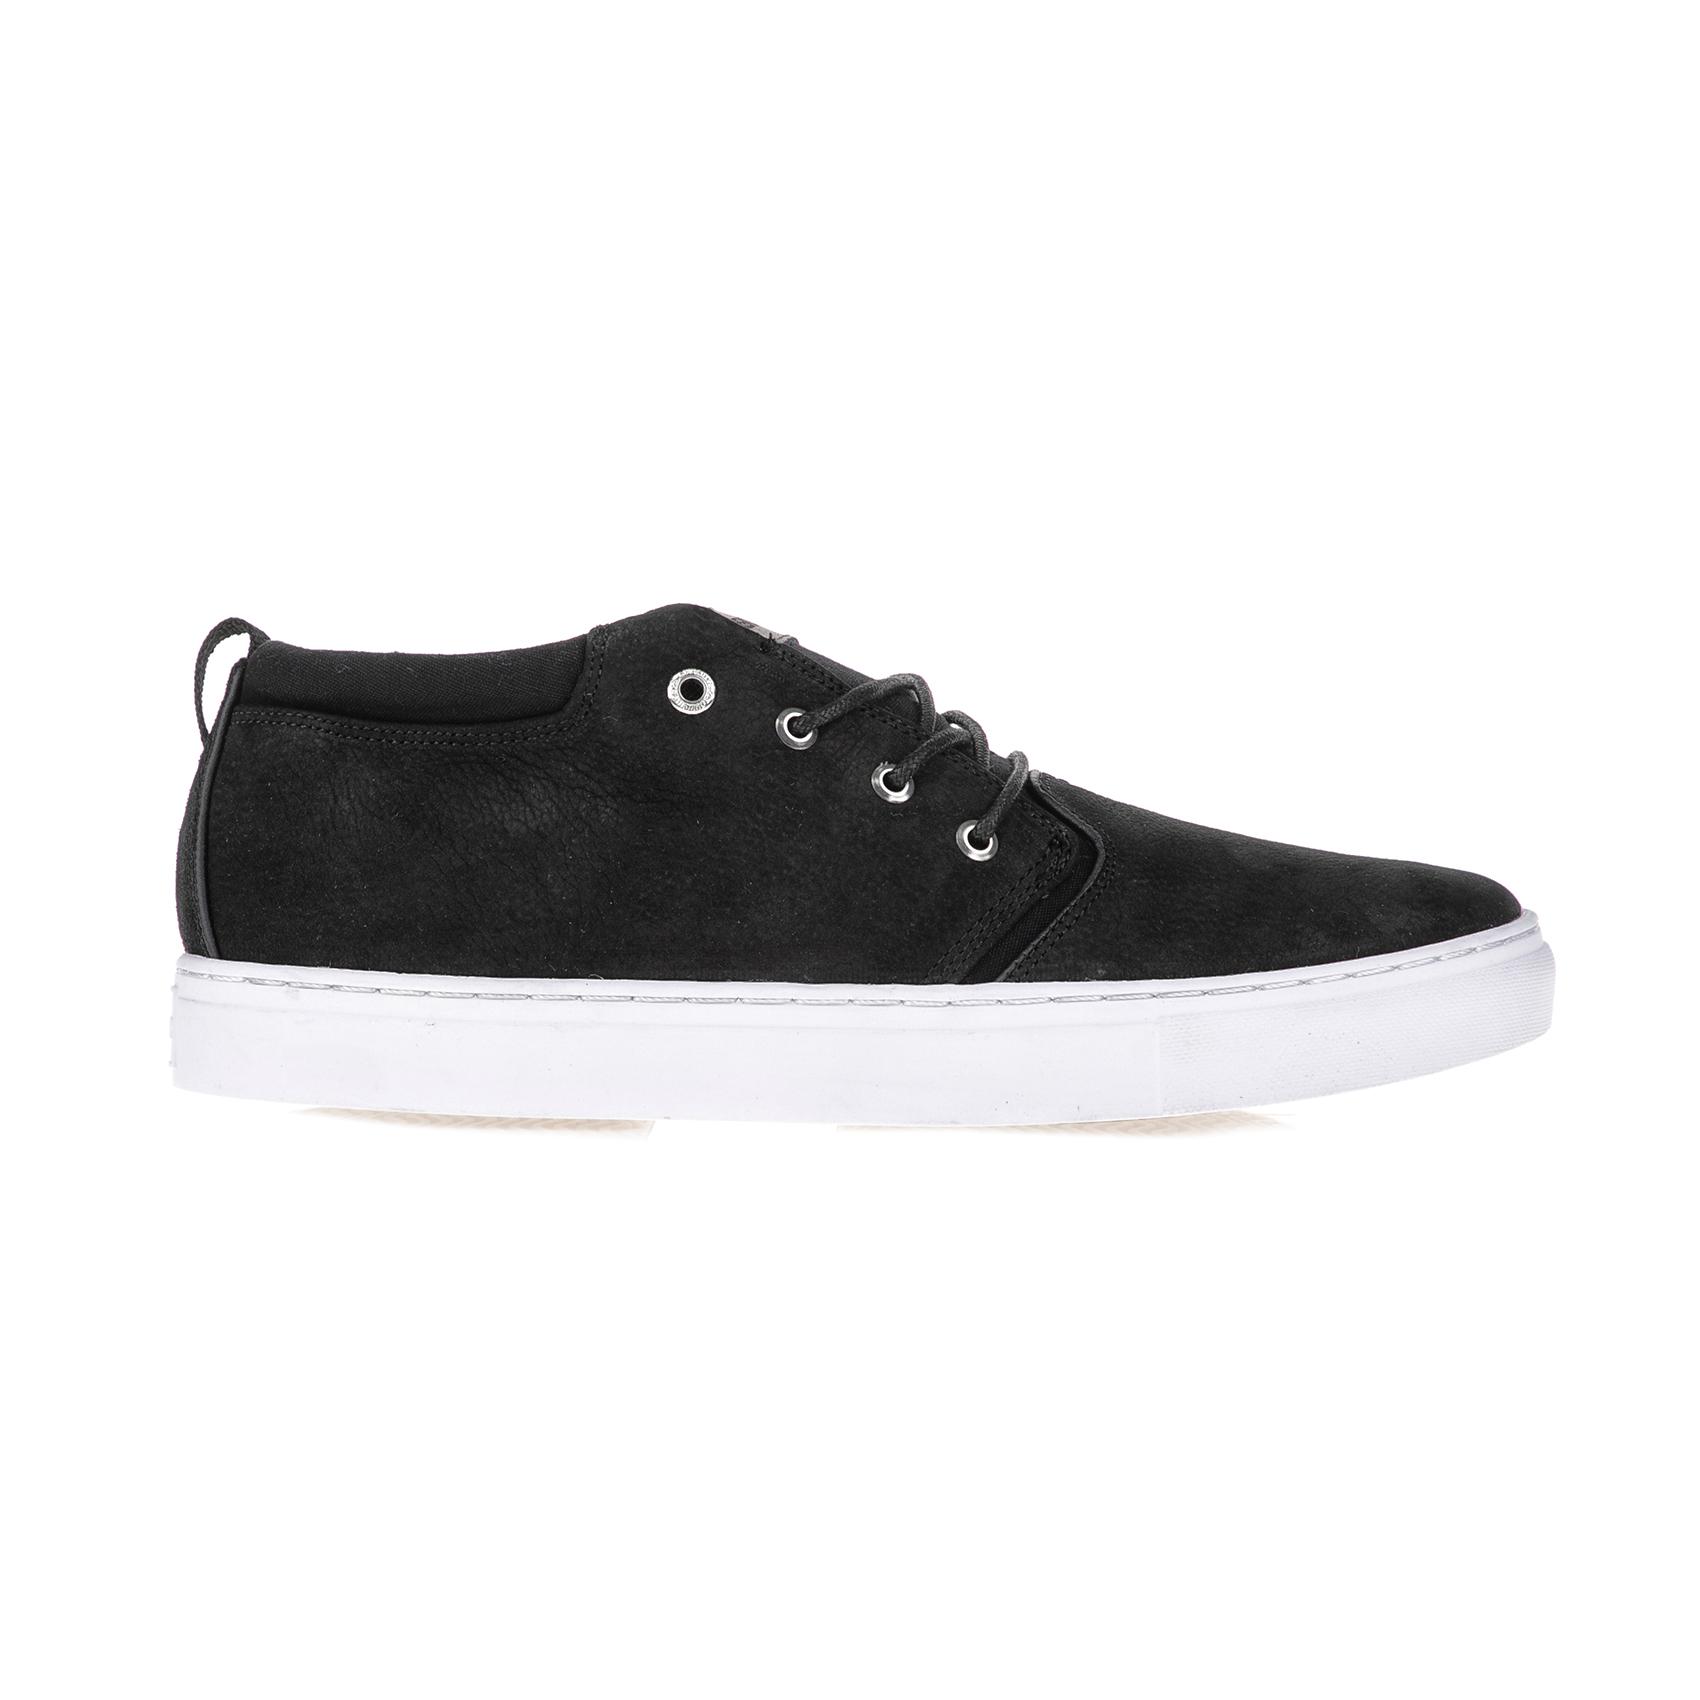 QUICKSILVER – Ανδρικά παπούτσια GRIFFIN Quicksilver μαύρα